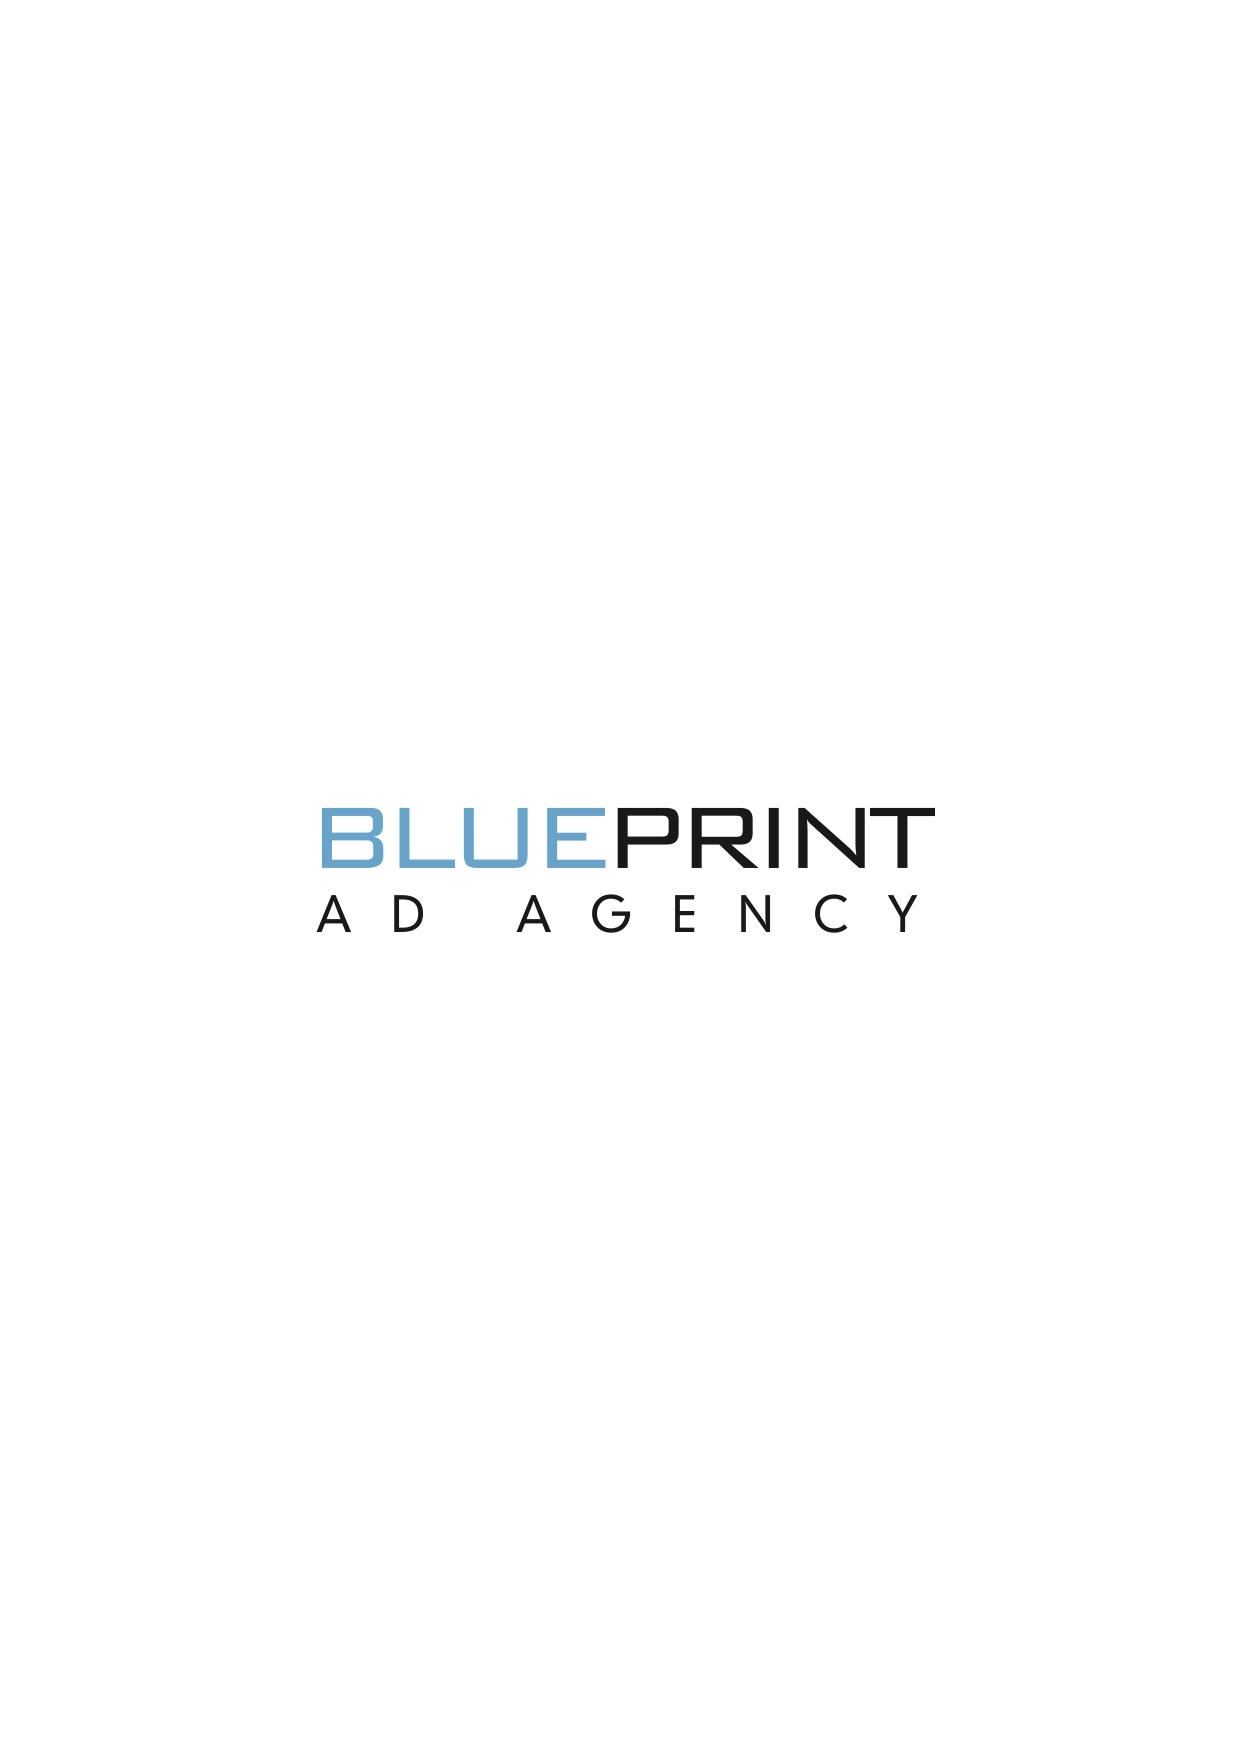 BluePrint Advertising Agency